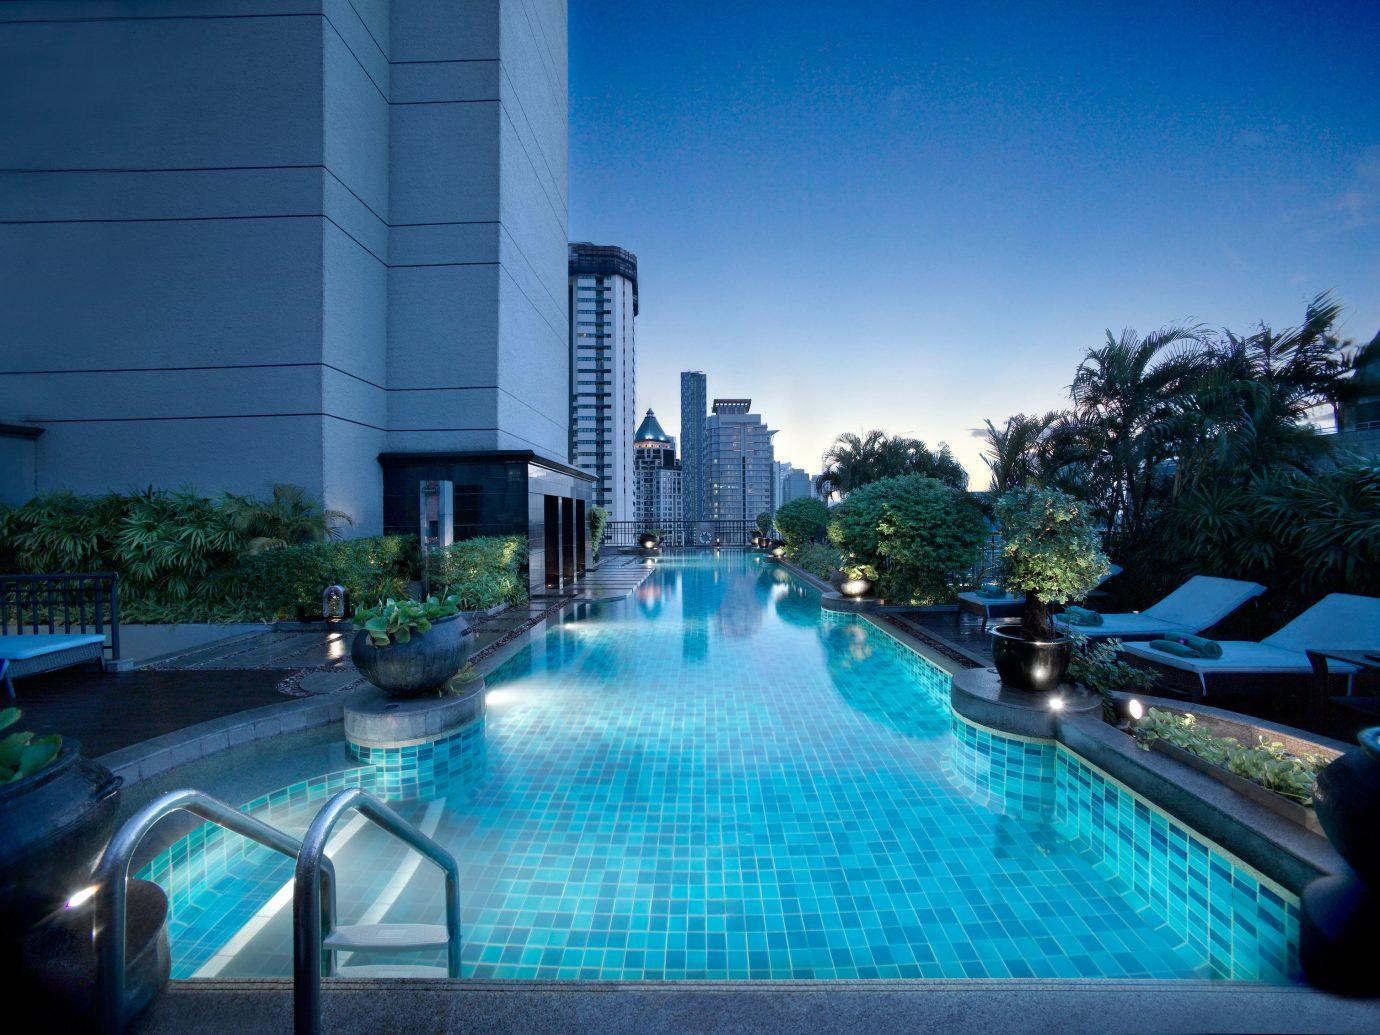 Hotels outdoor swimming pool leisure condominium reflecting pool estate reflection Resort